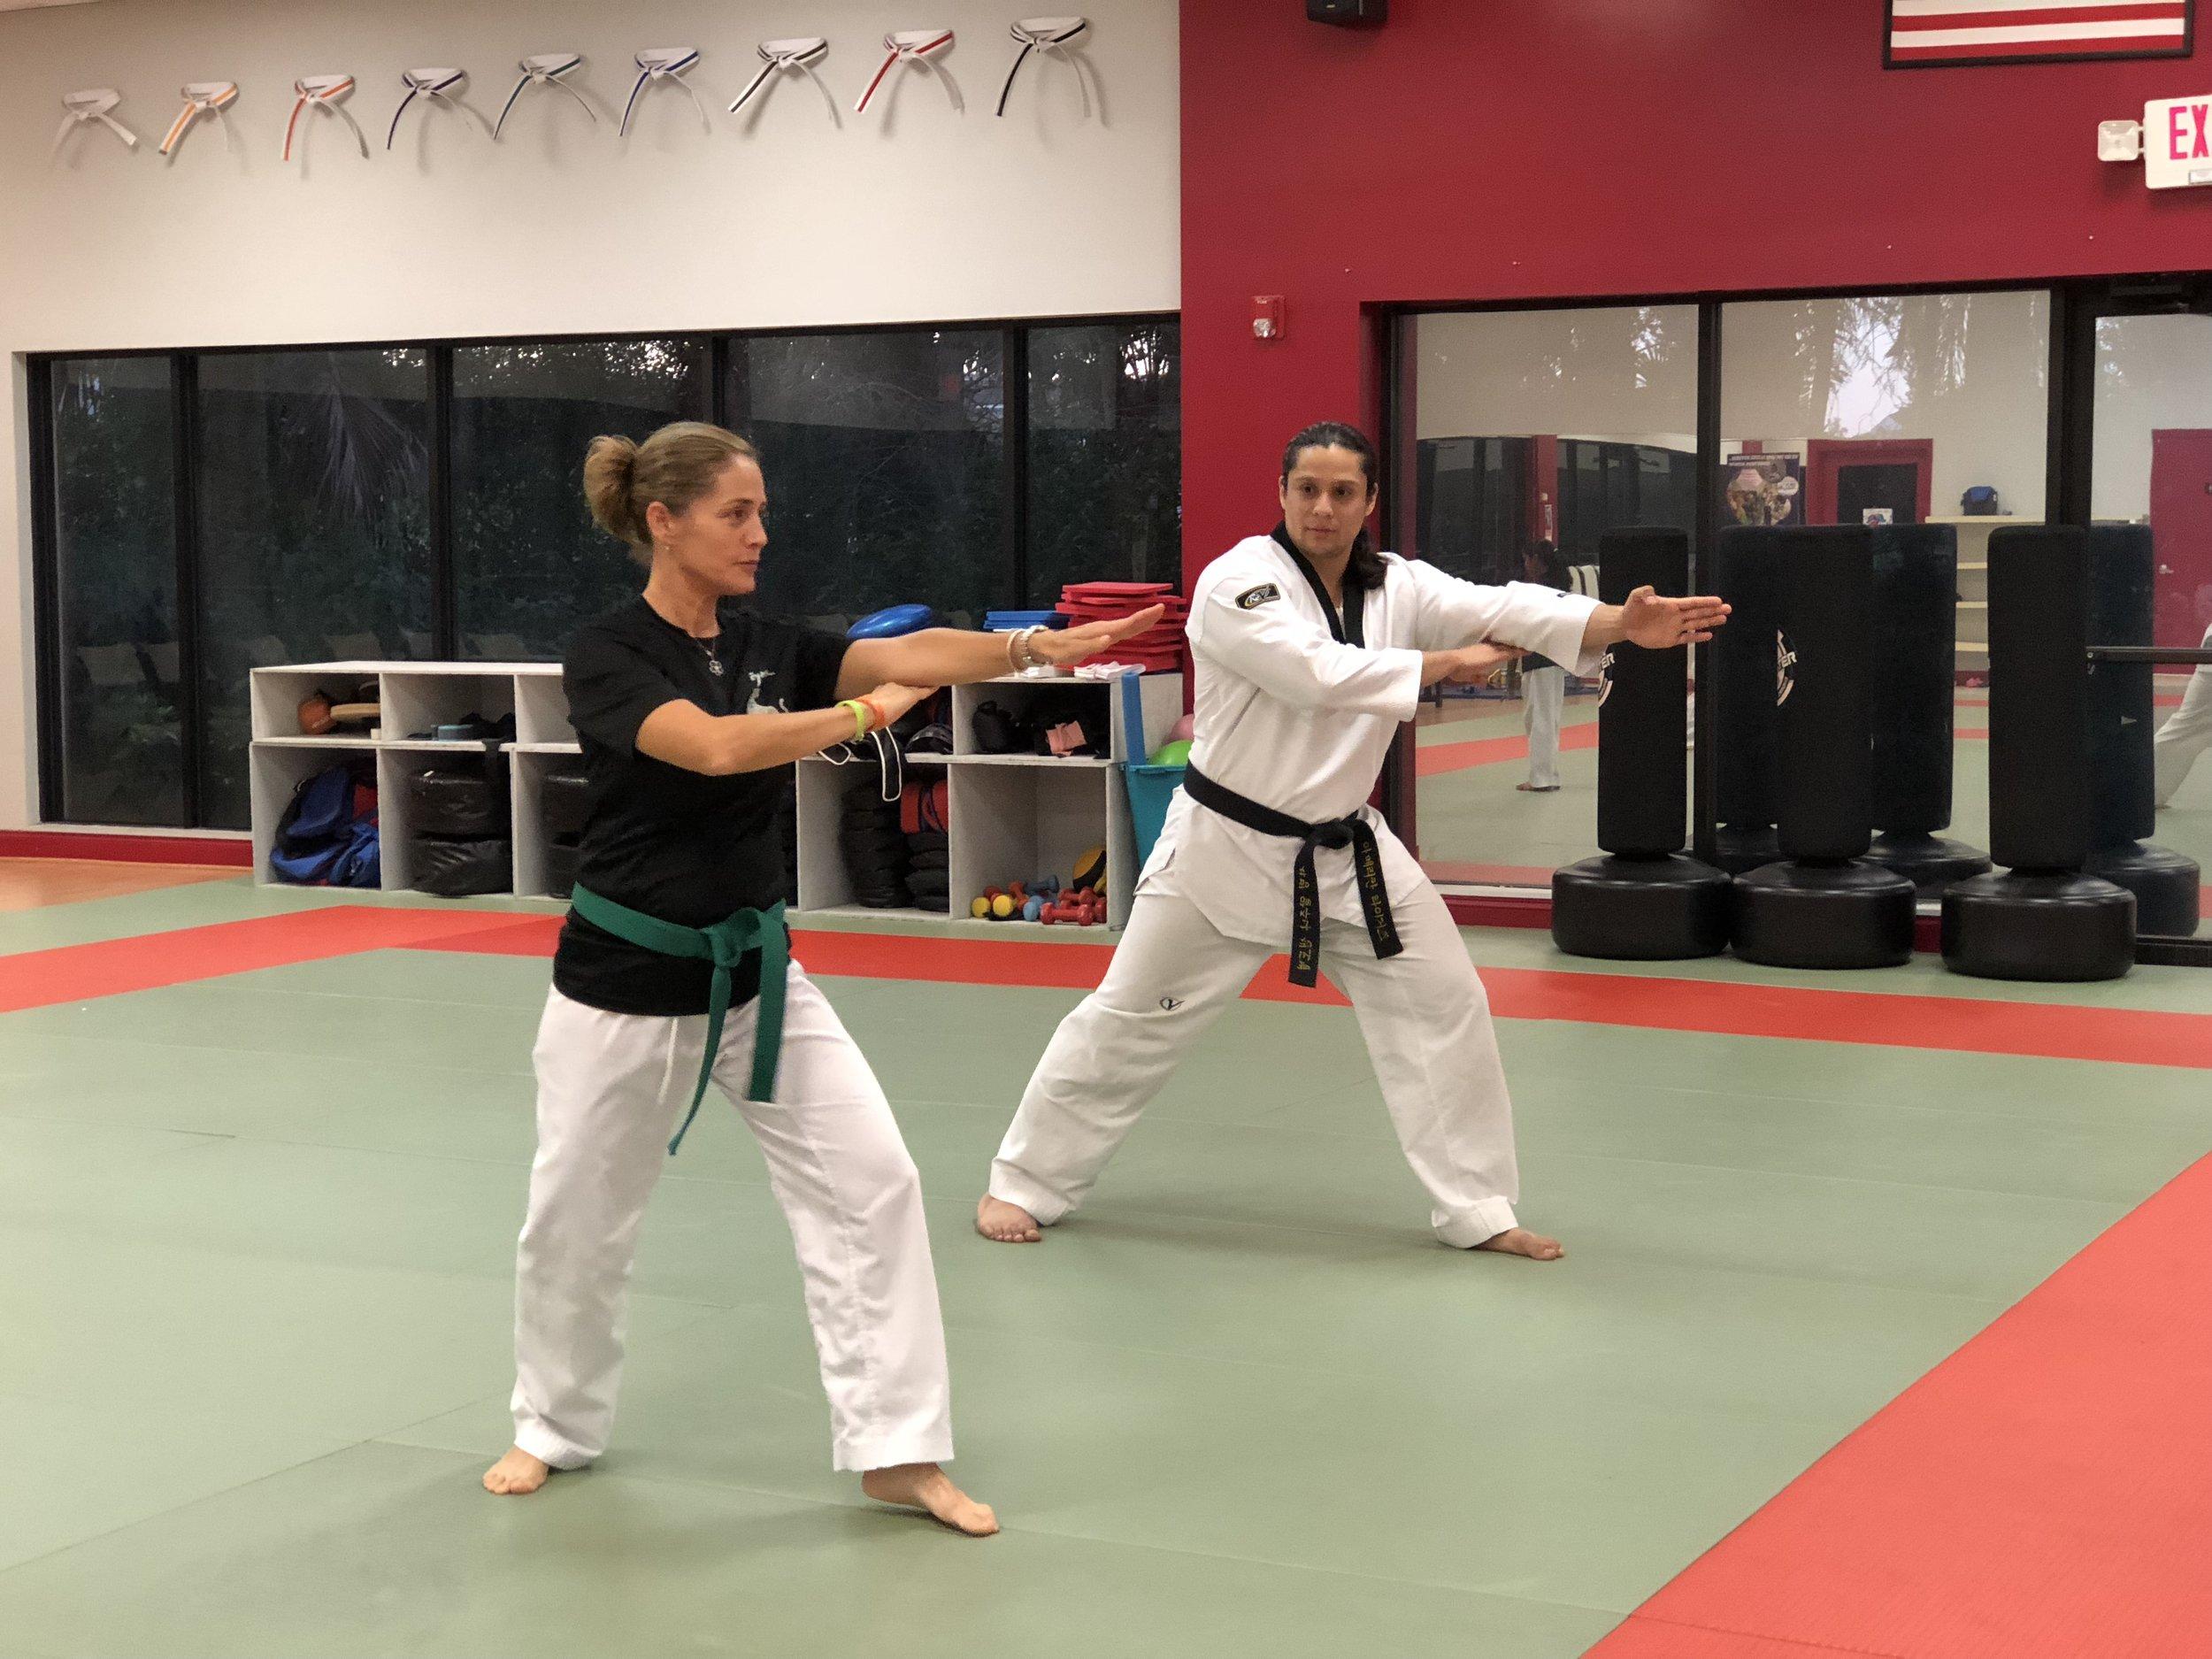 Weston Adult Karate Classes